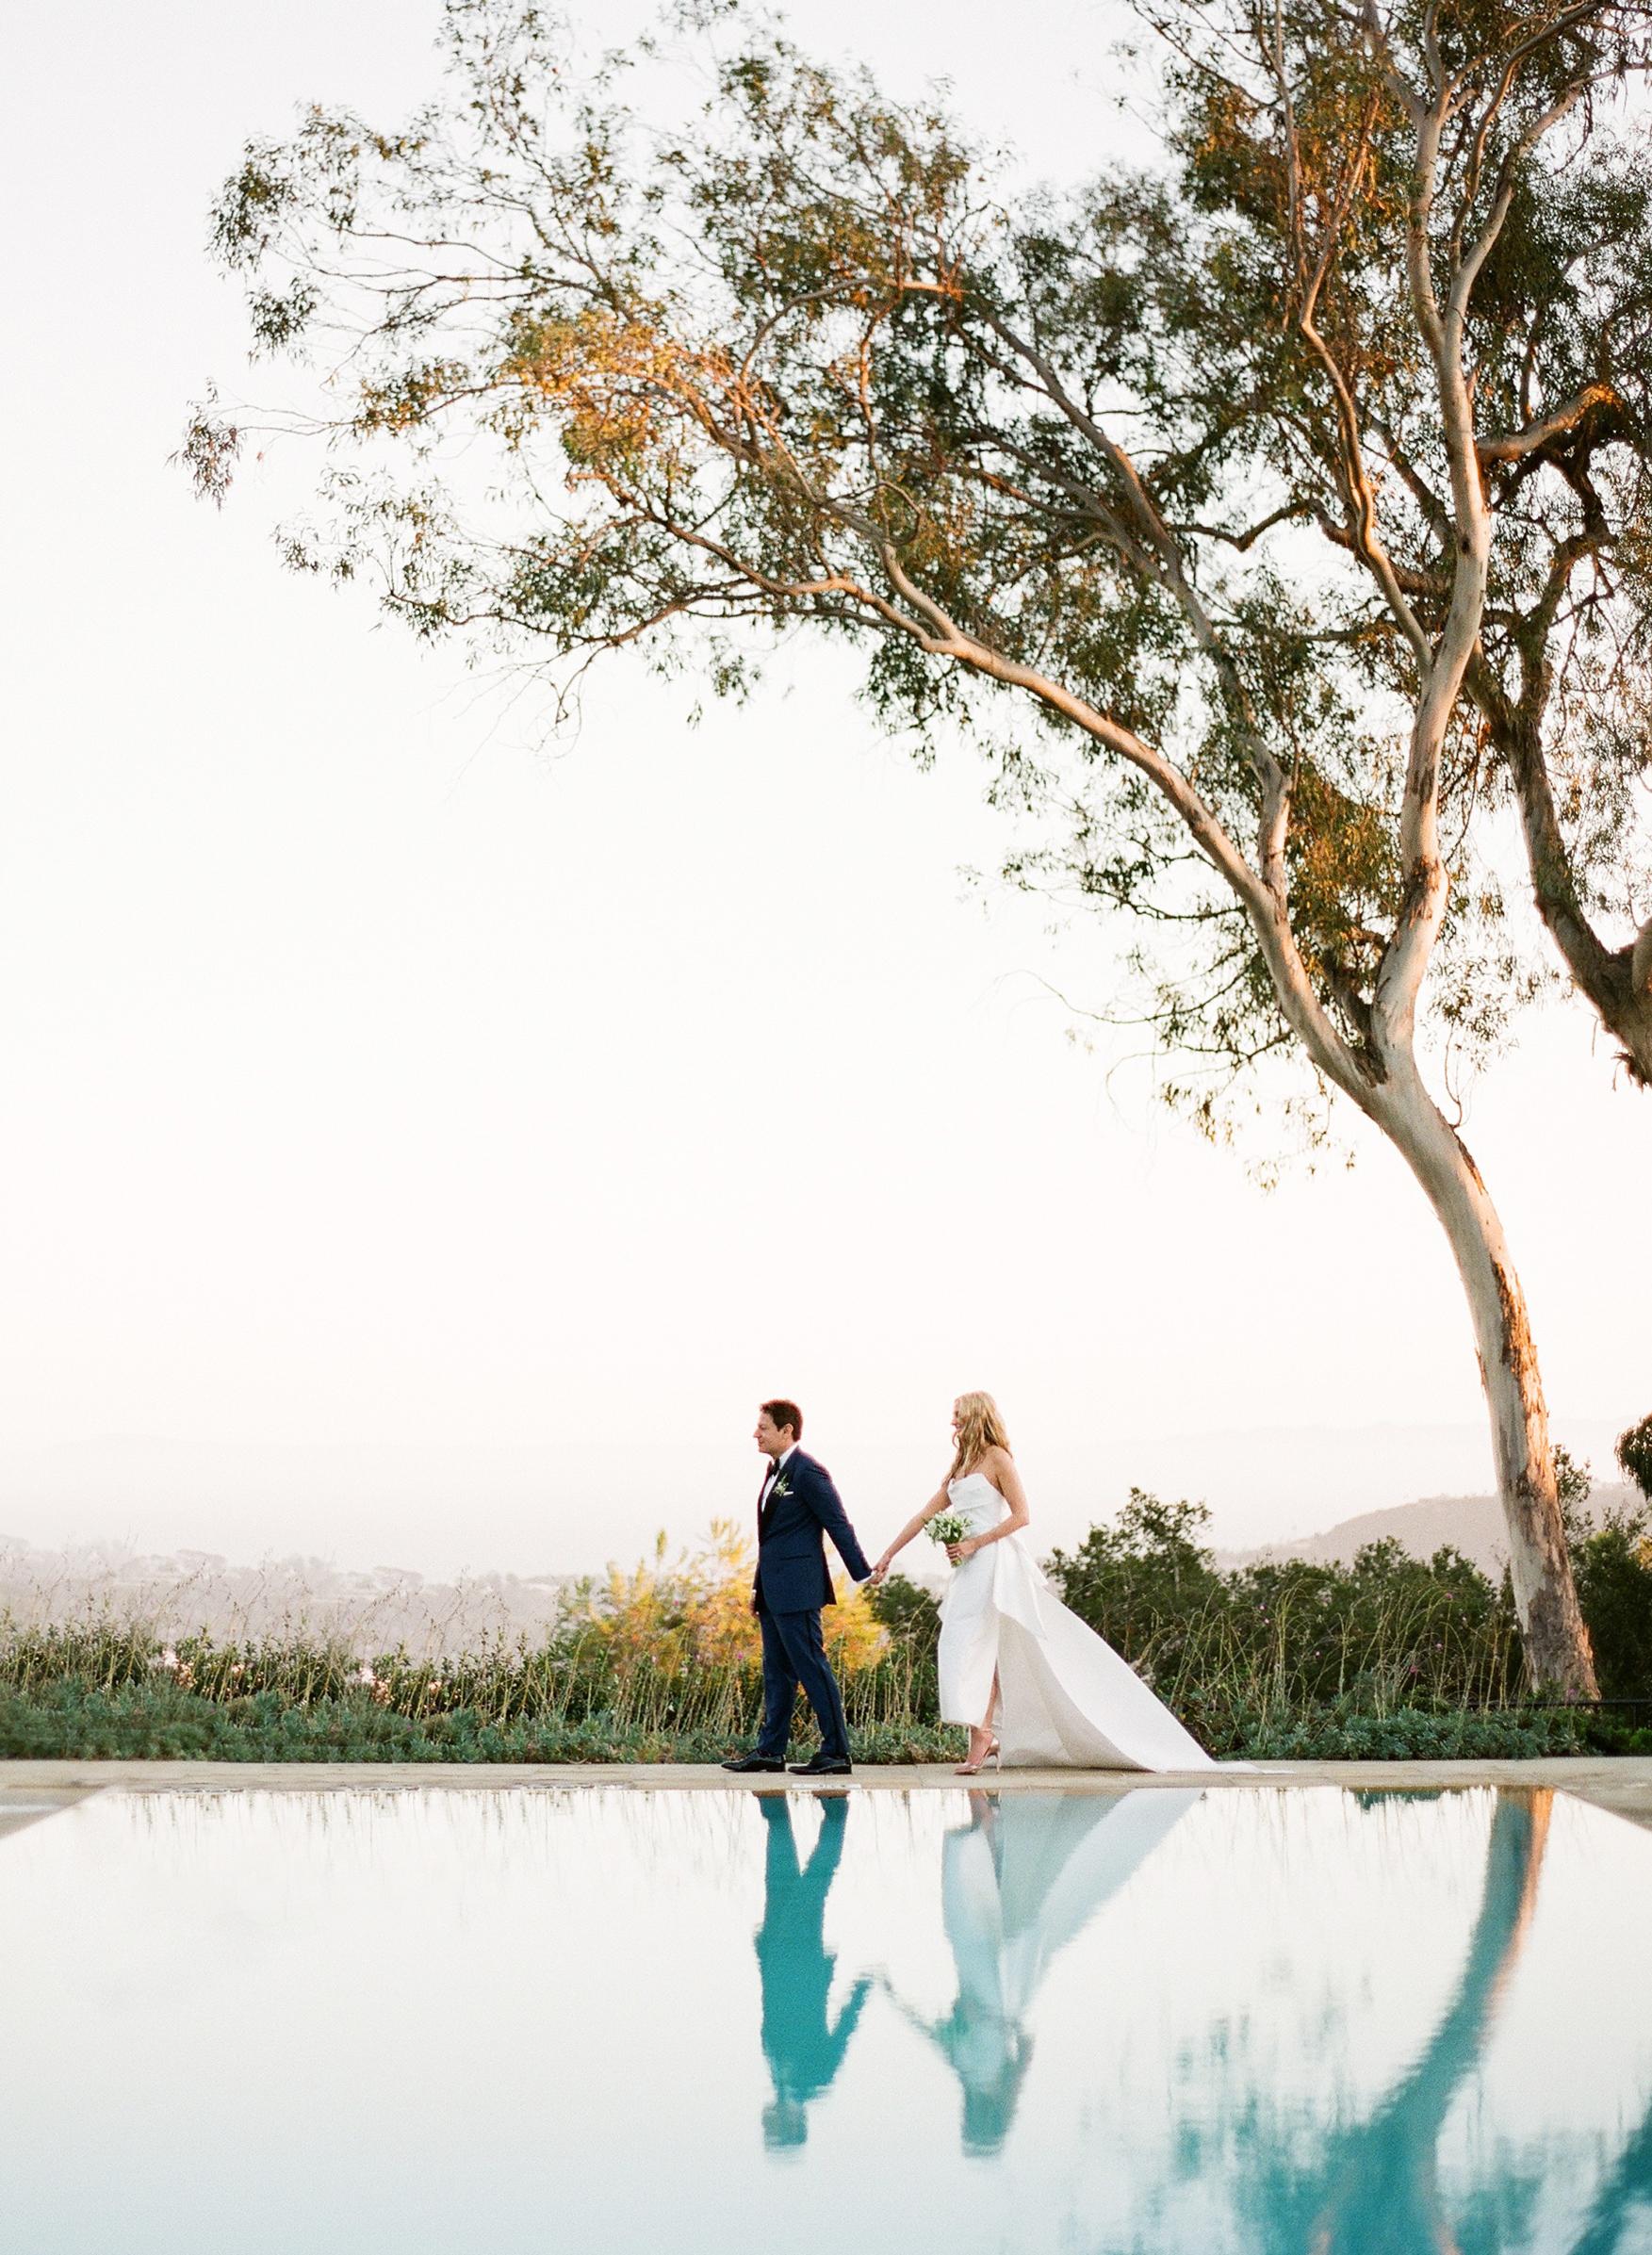 katy michael wedding couple walking california view